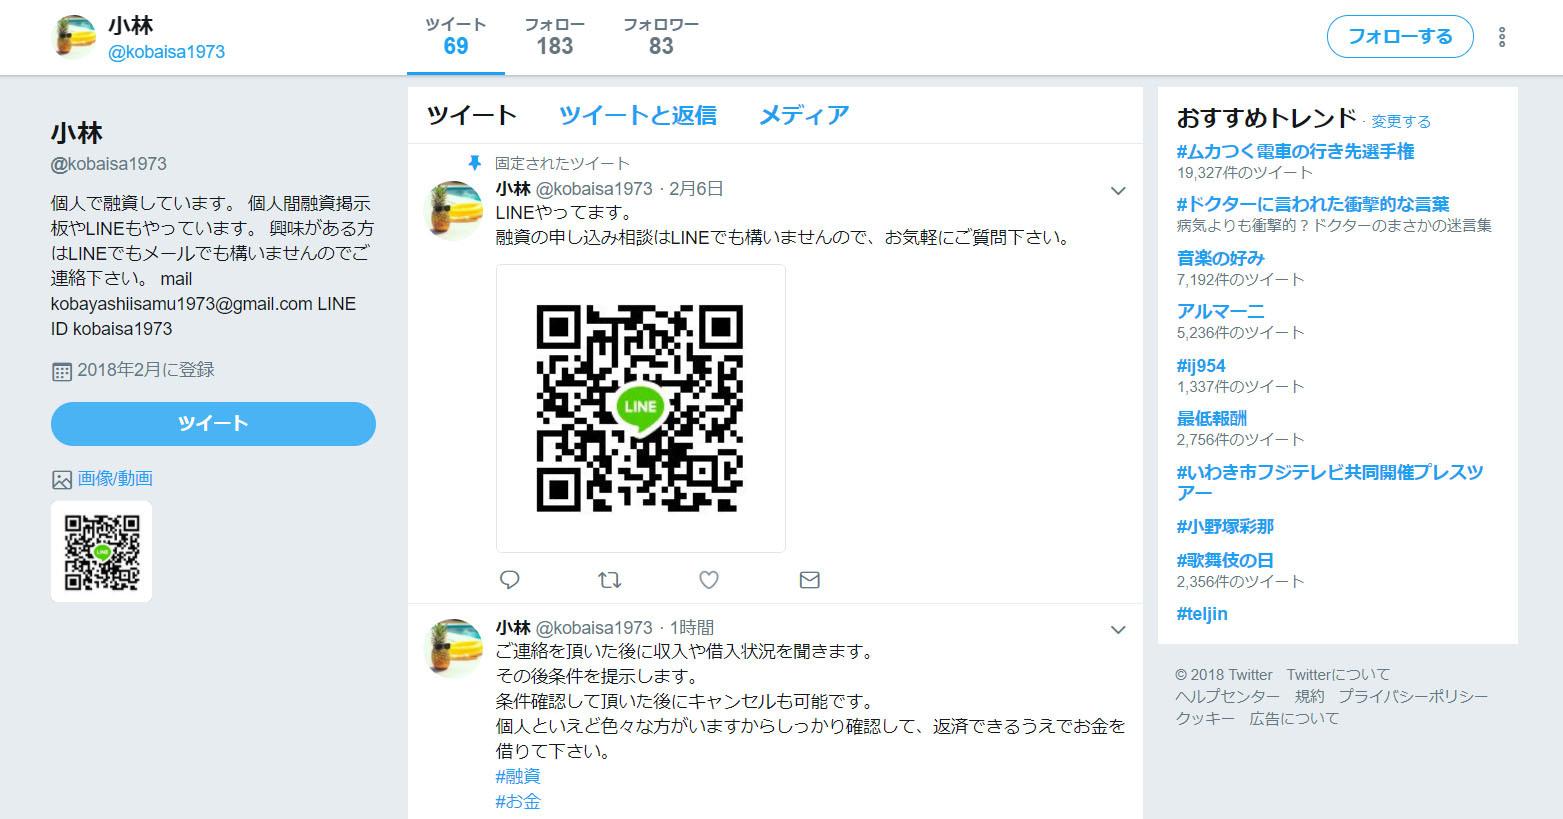 https://twitter.com/kobaisa1973